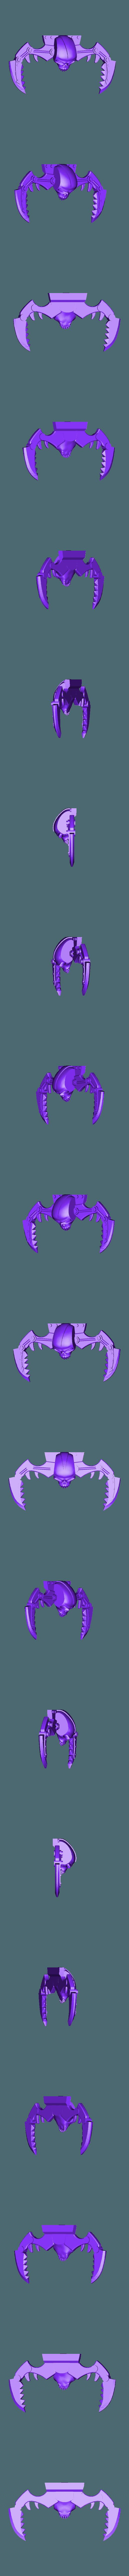 LordGonamCommandShipSkull.stl Download free STL file GONAM Lord GONAM Command Ship proxy • 3D printer design, barnEbiss2